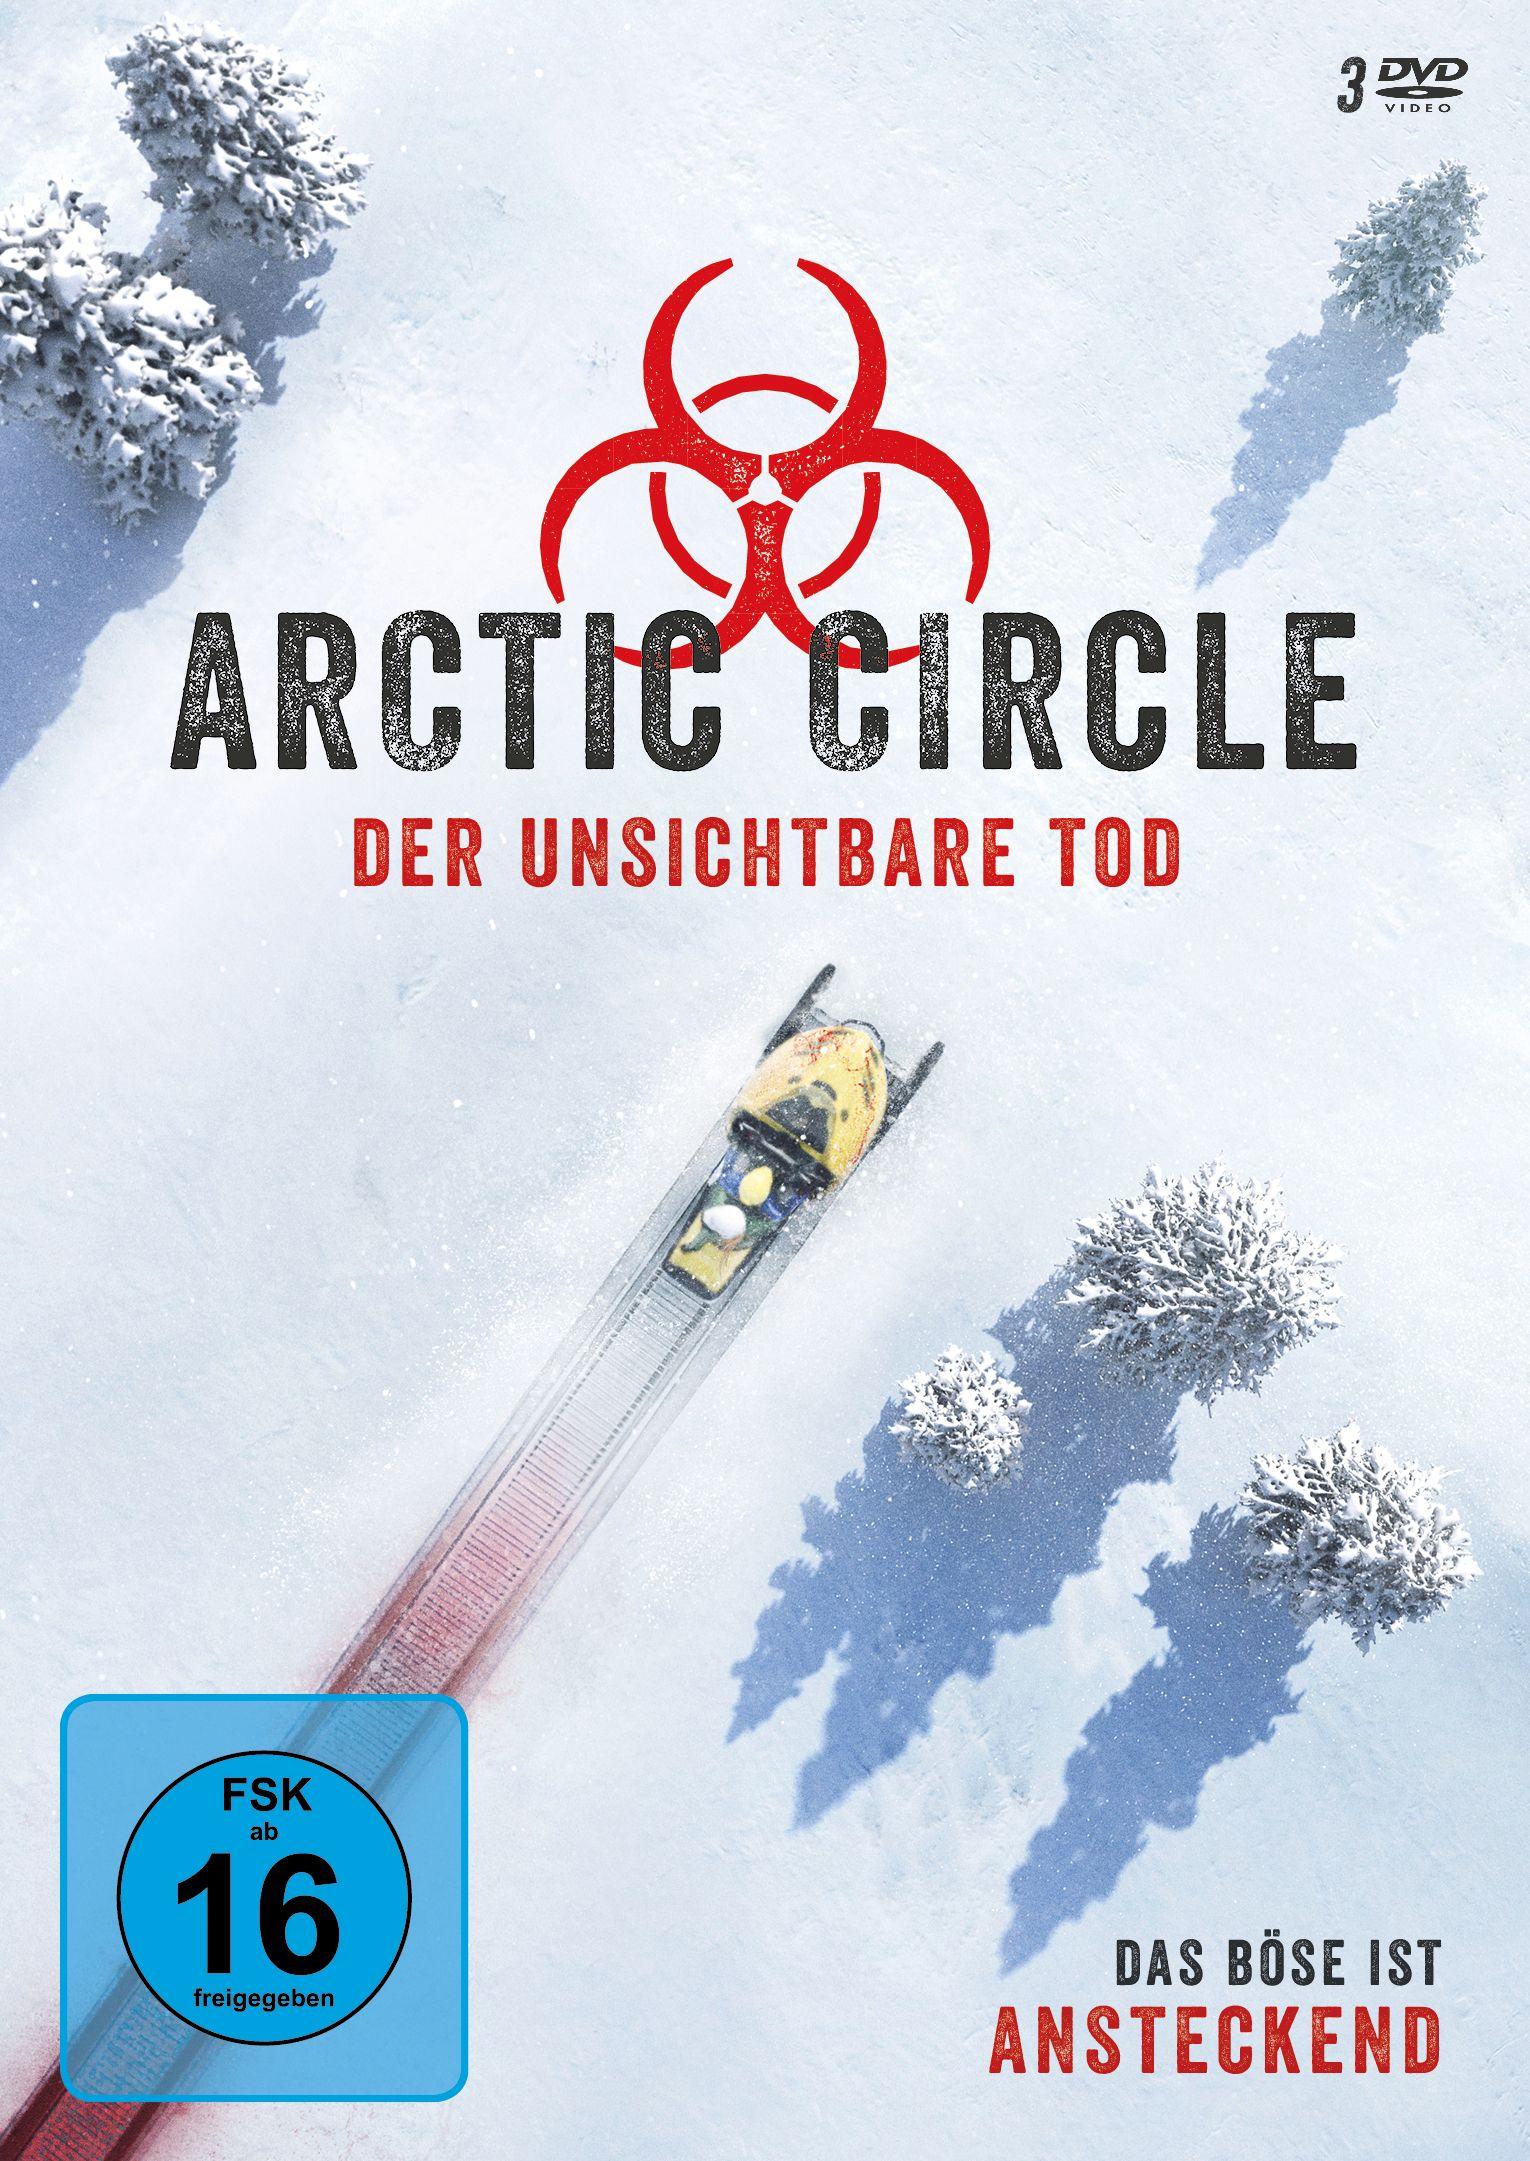 DVD-Cover Arctic Circle